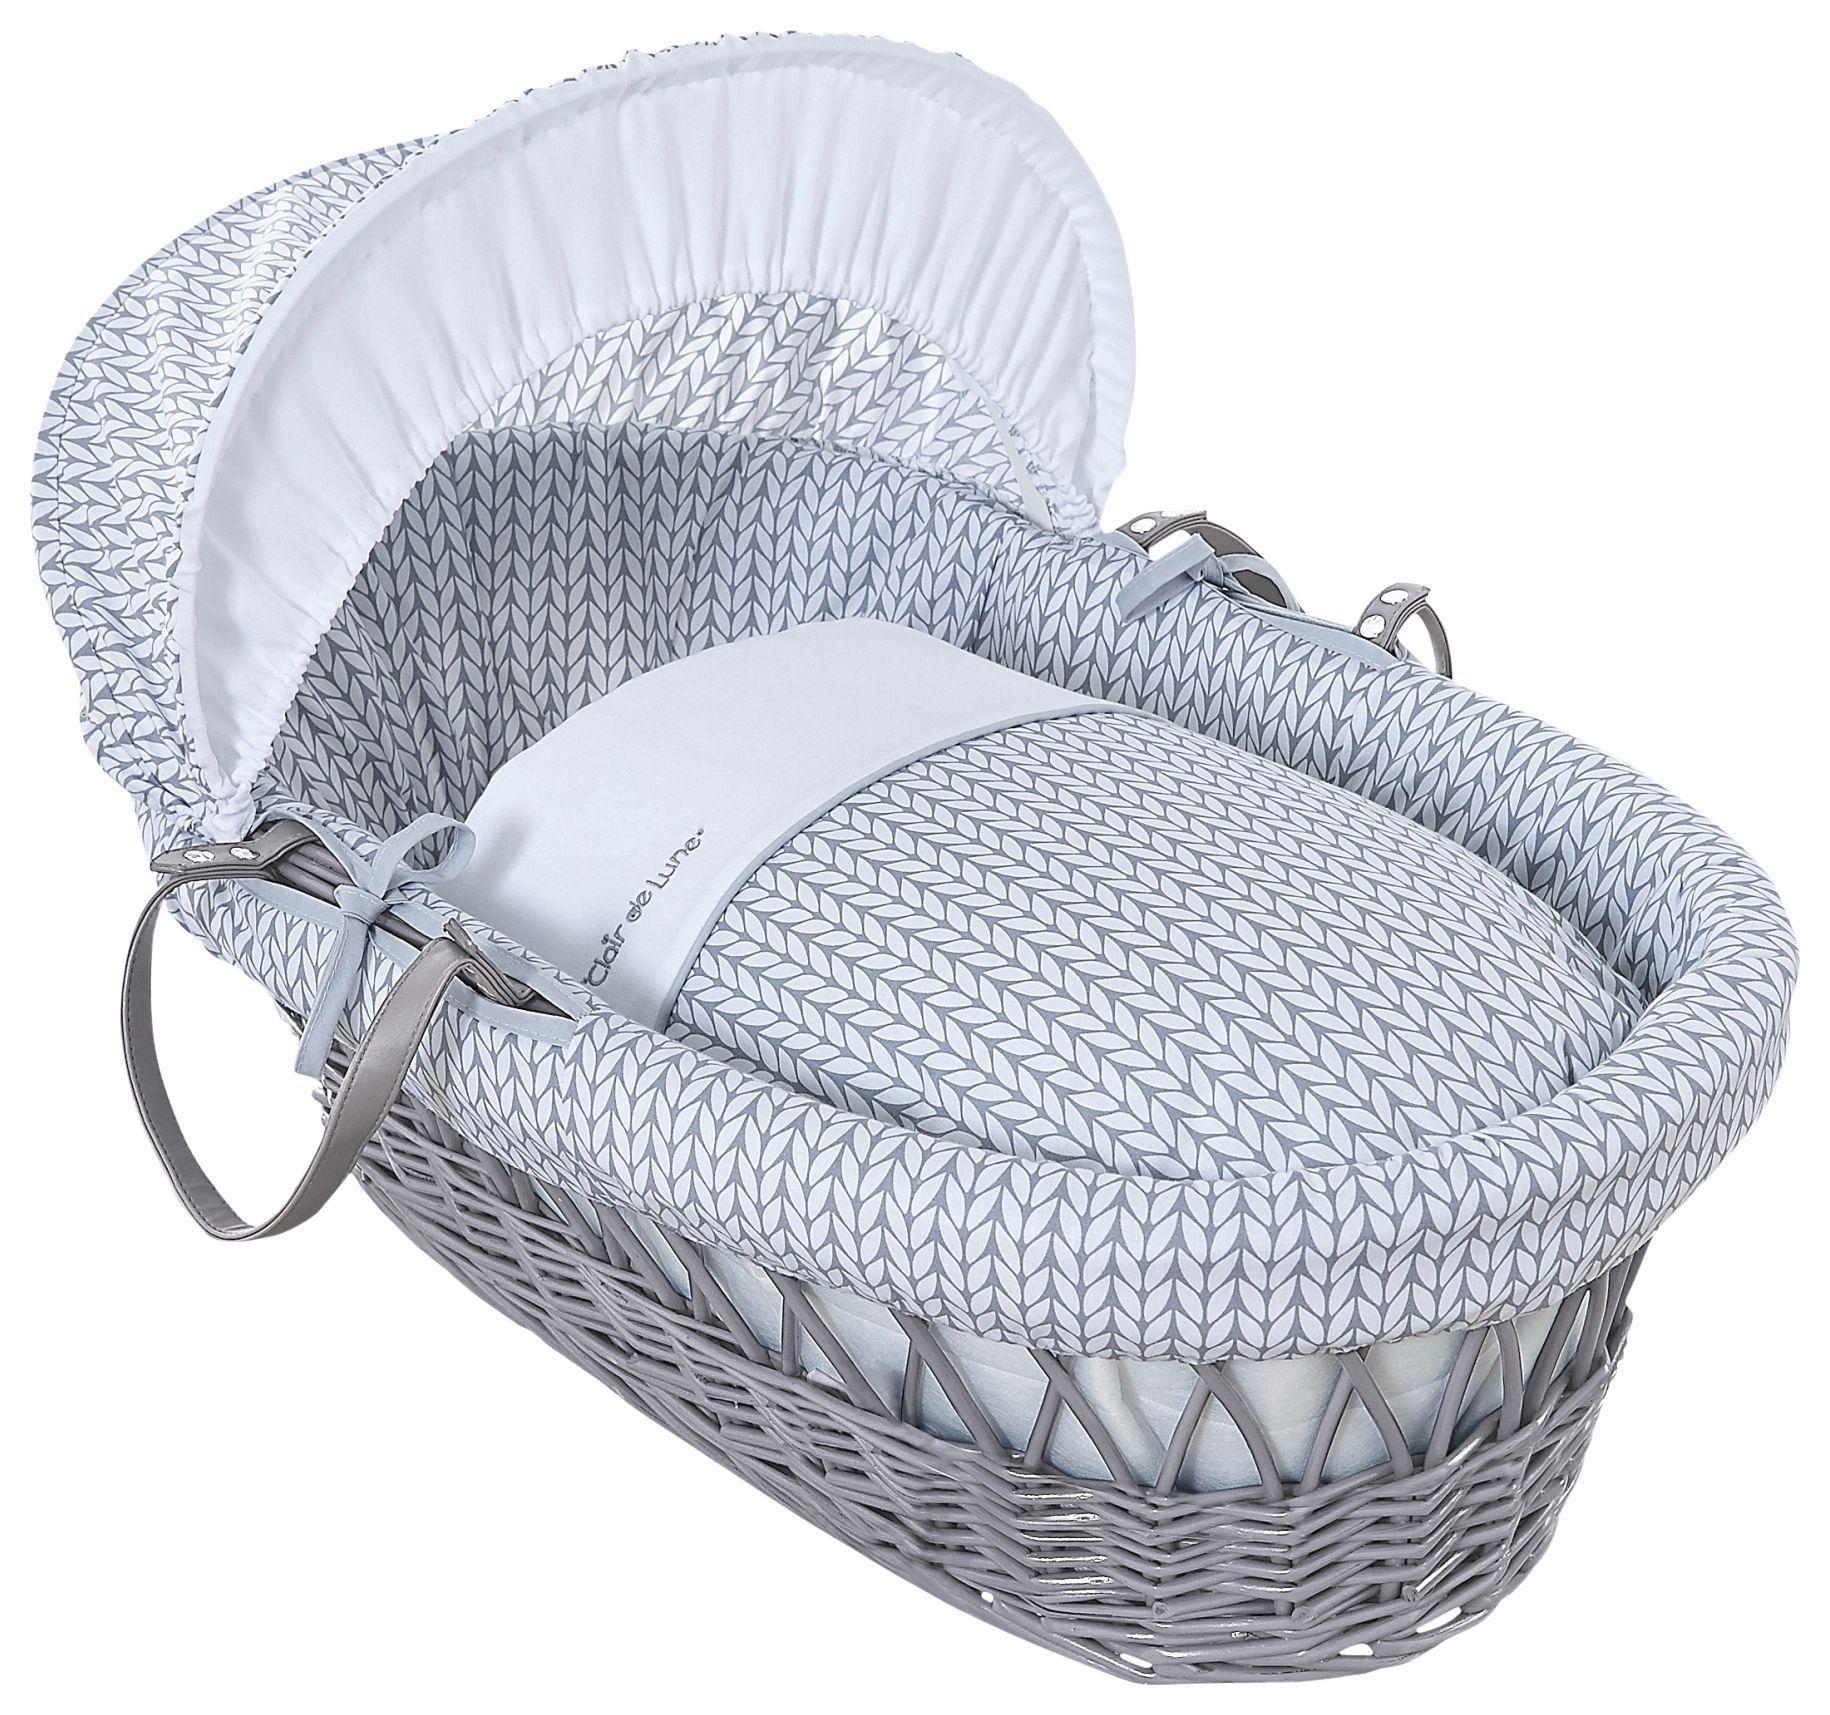 Image of Clair De Lune Barley B??b?? Grey Wicker Moses Basket - Grey.